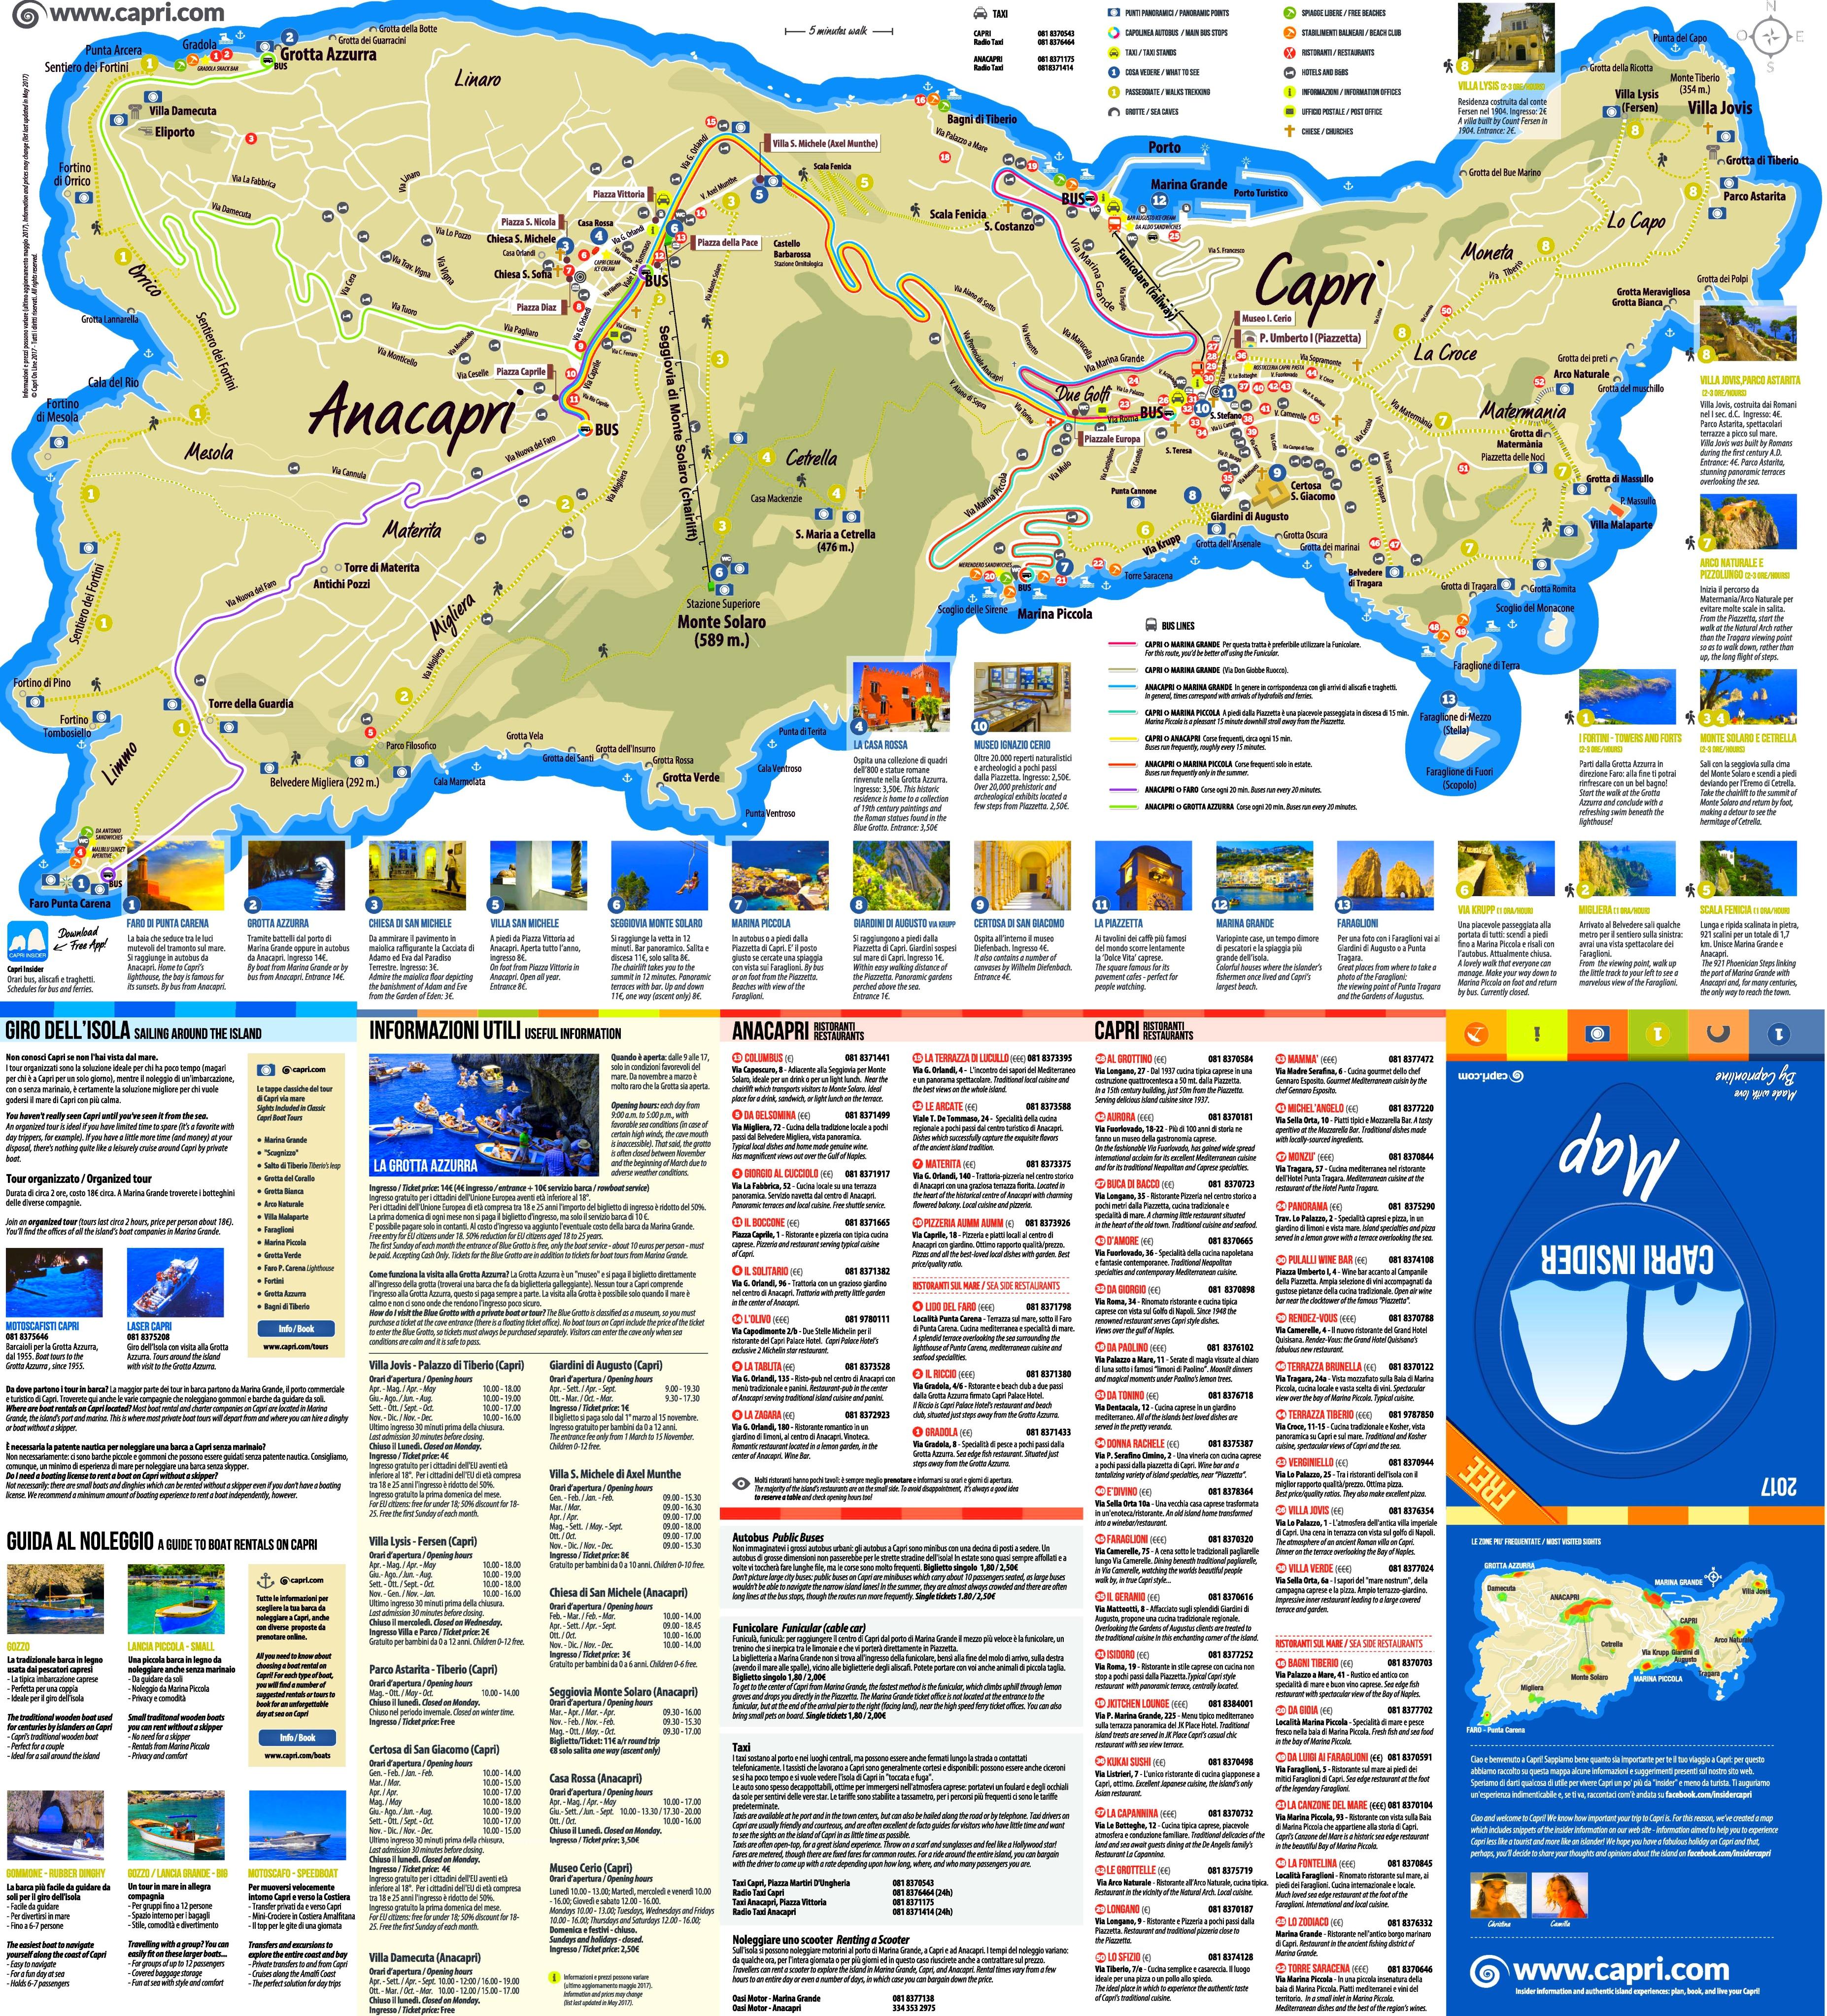 Capri sightseeing map